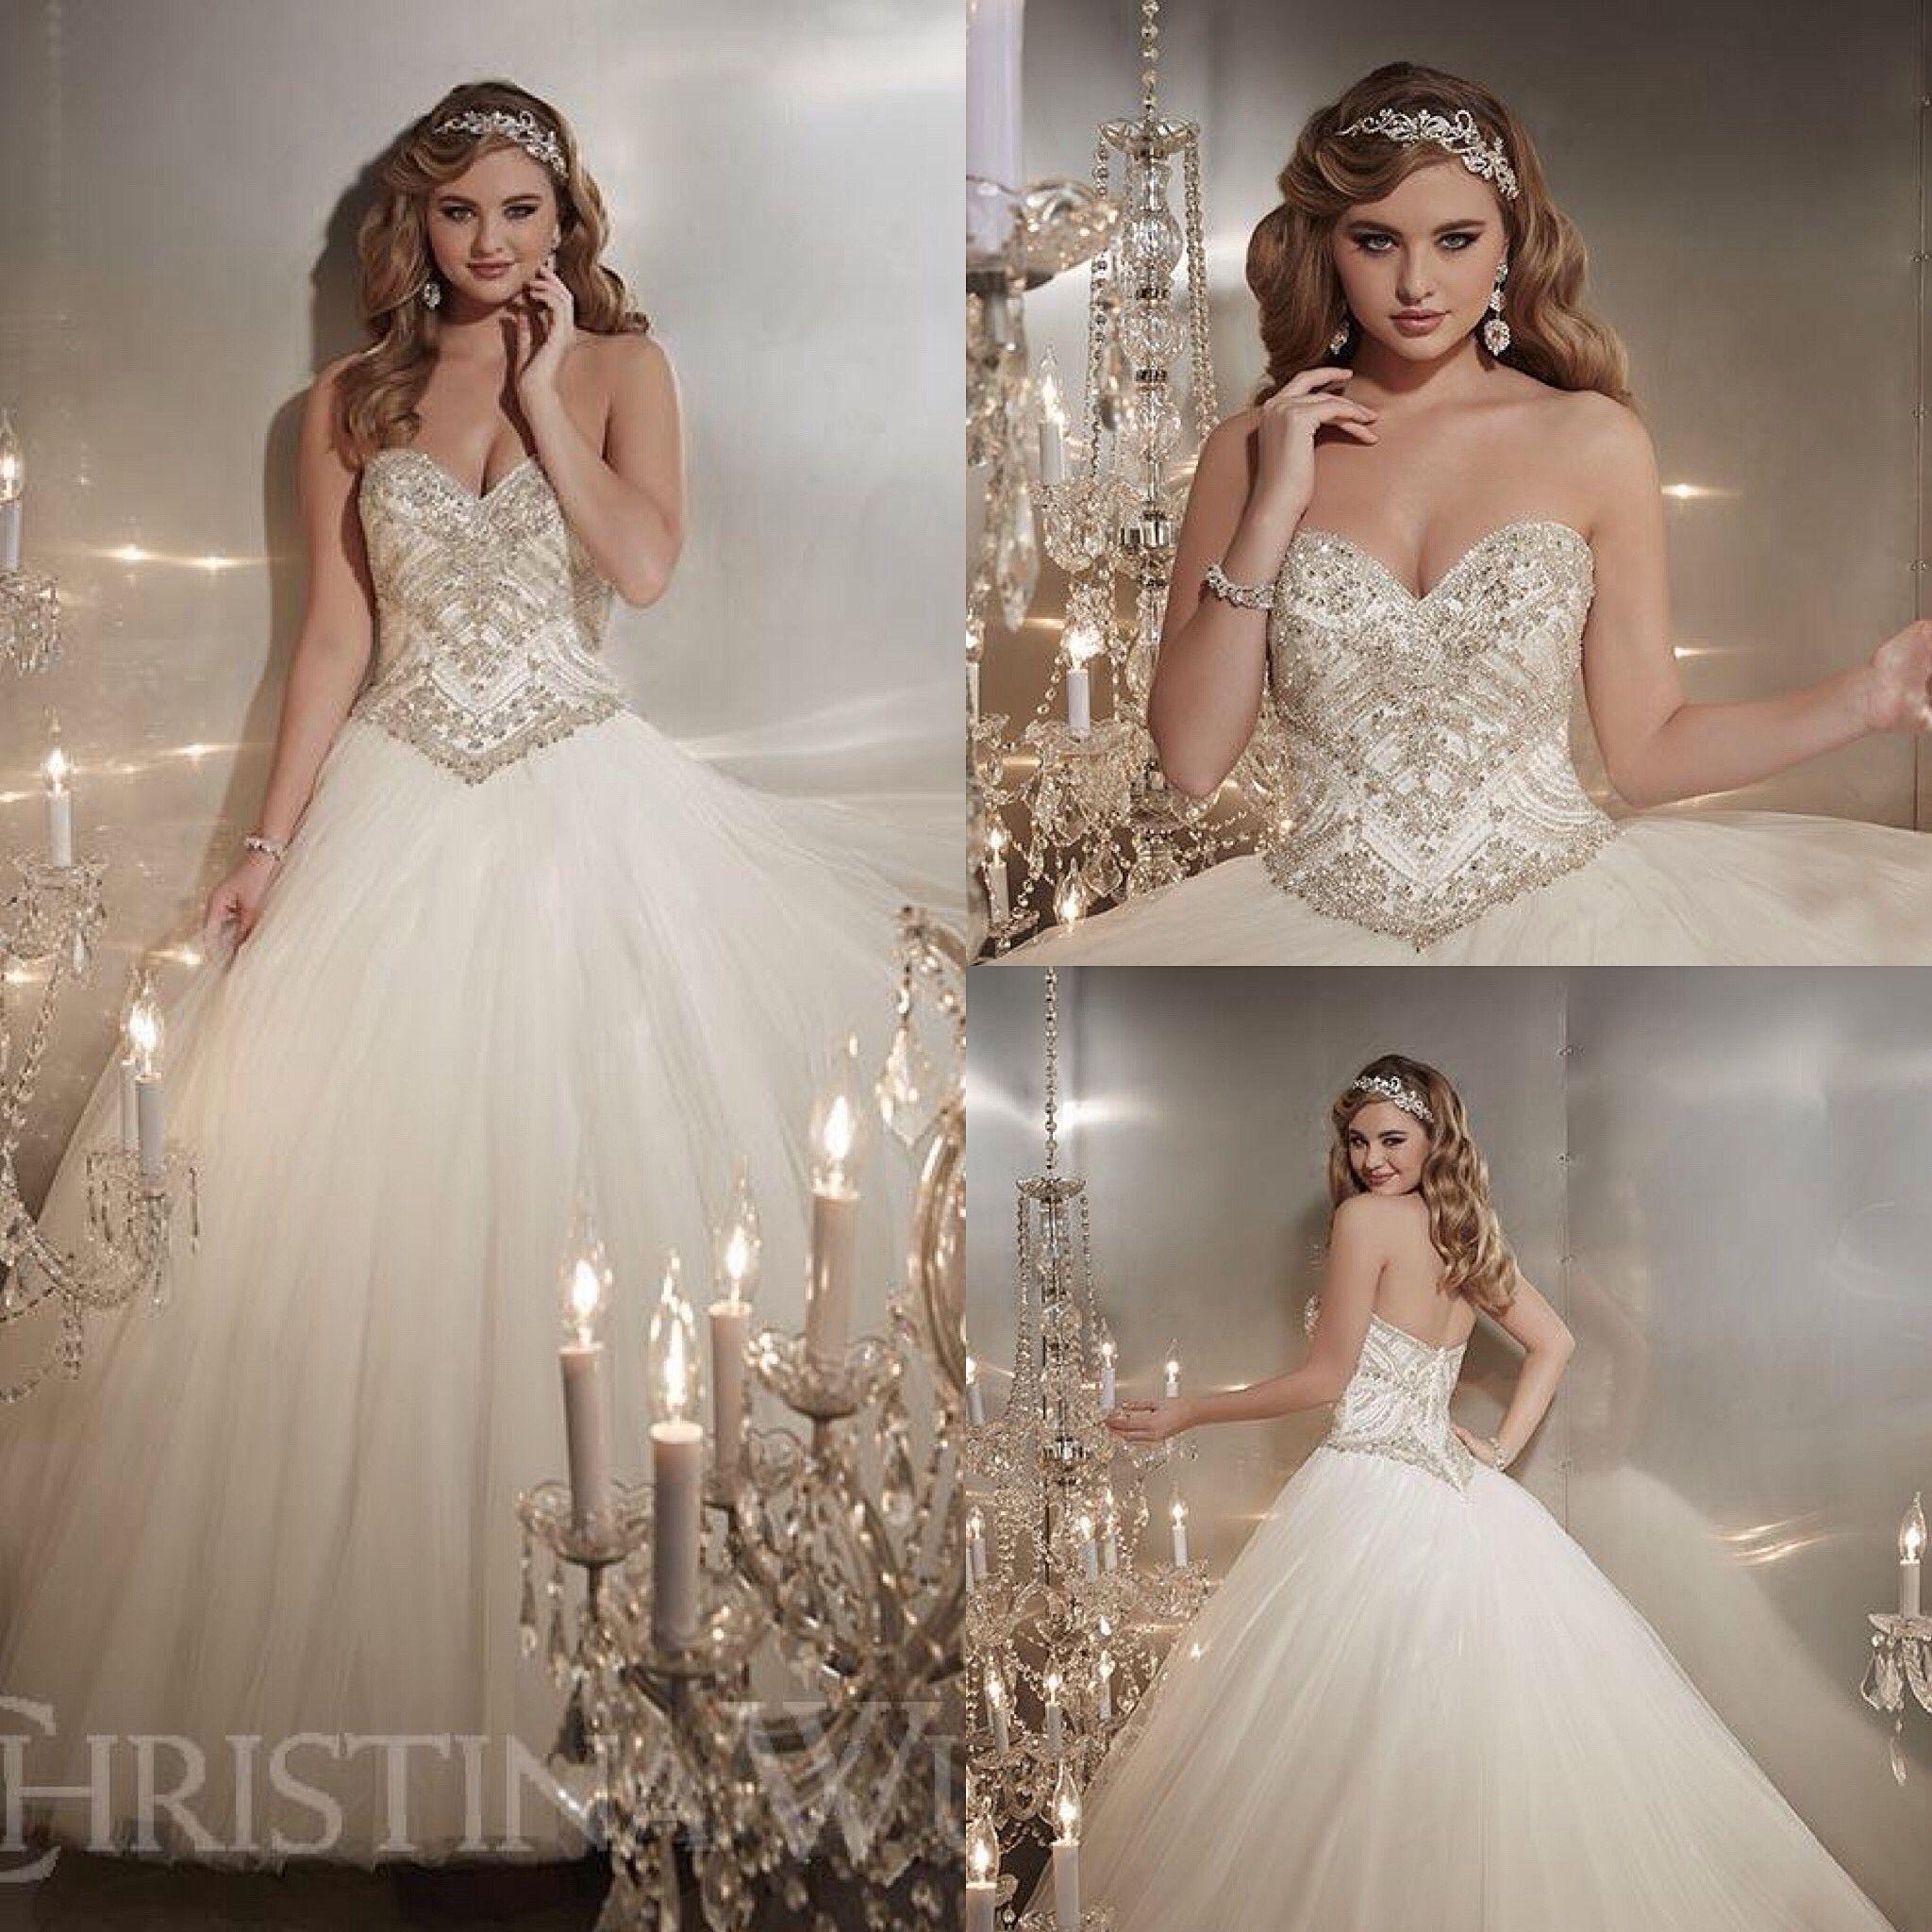 Christina wu wedding dresses  Christina Wu  IvorySilver  Christina Wu Bridal  Pinterest